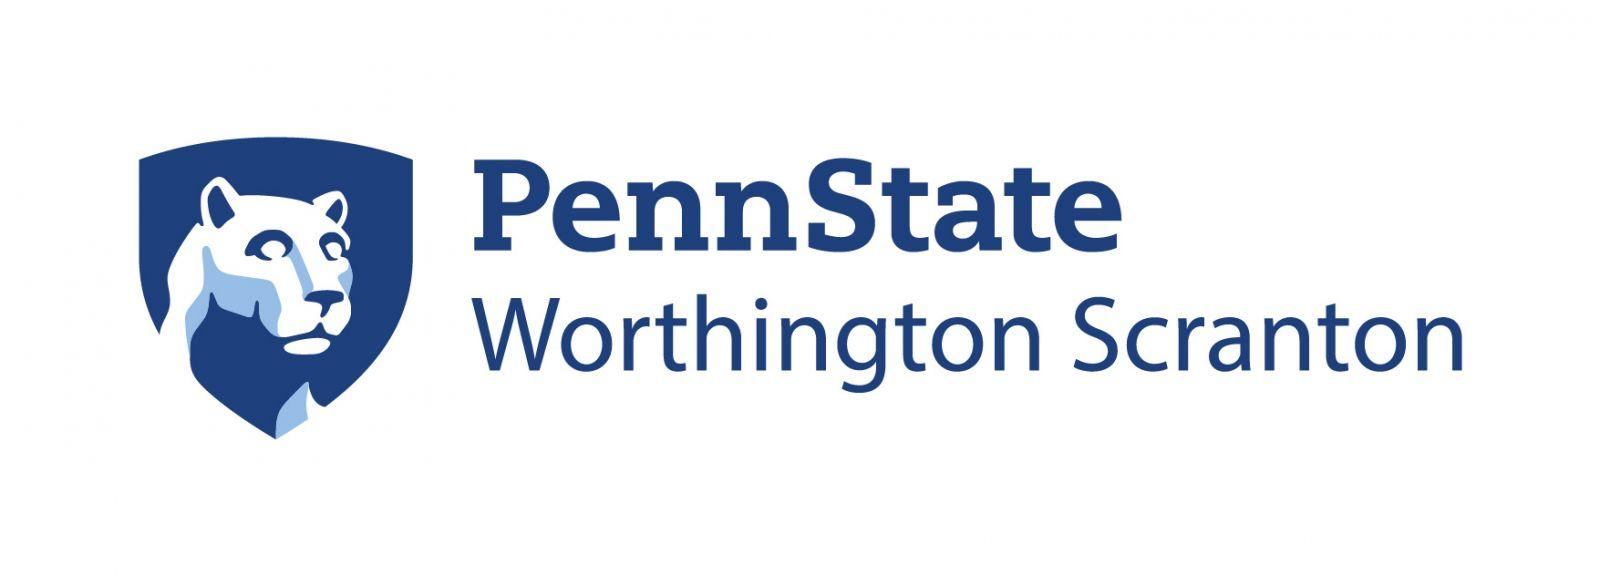 Pennstate Worthington Scranton Certification Course Northeast